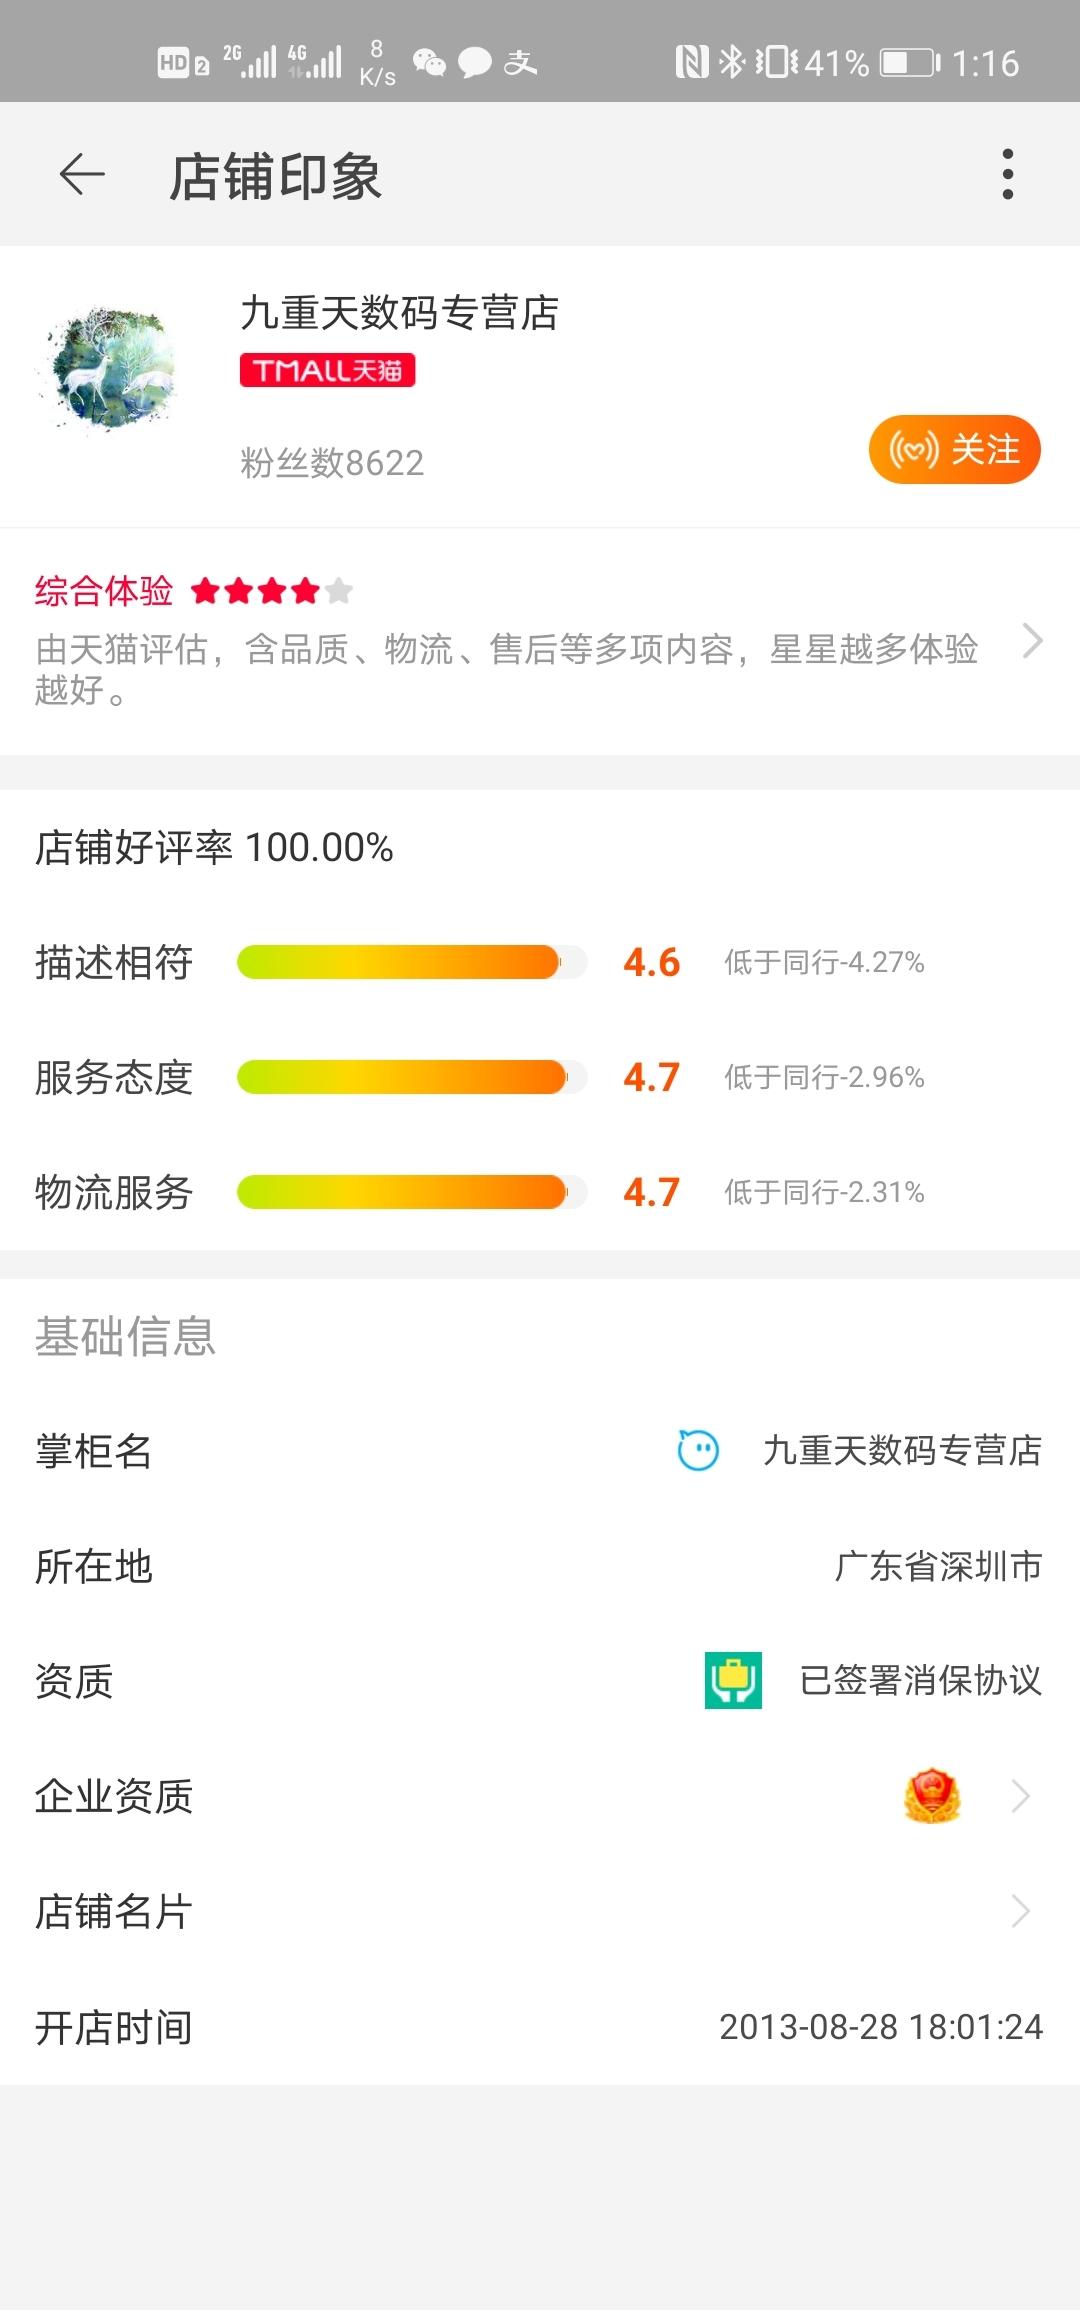 Screenshot_20200509_131654_com.taobao.taobao.jpg